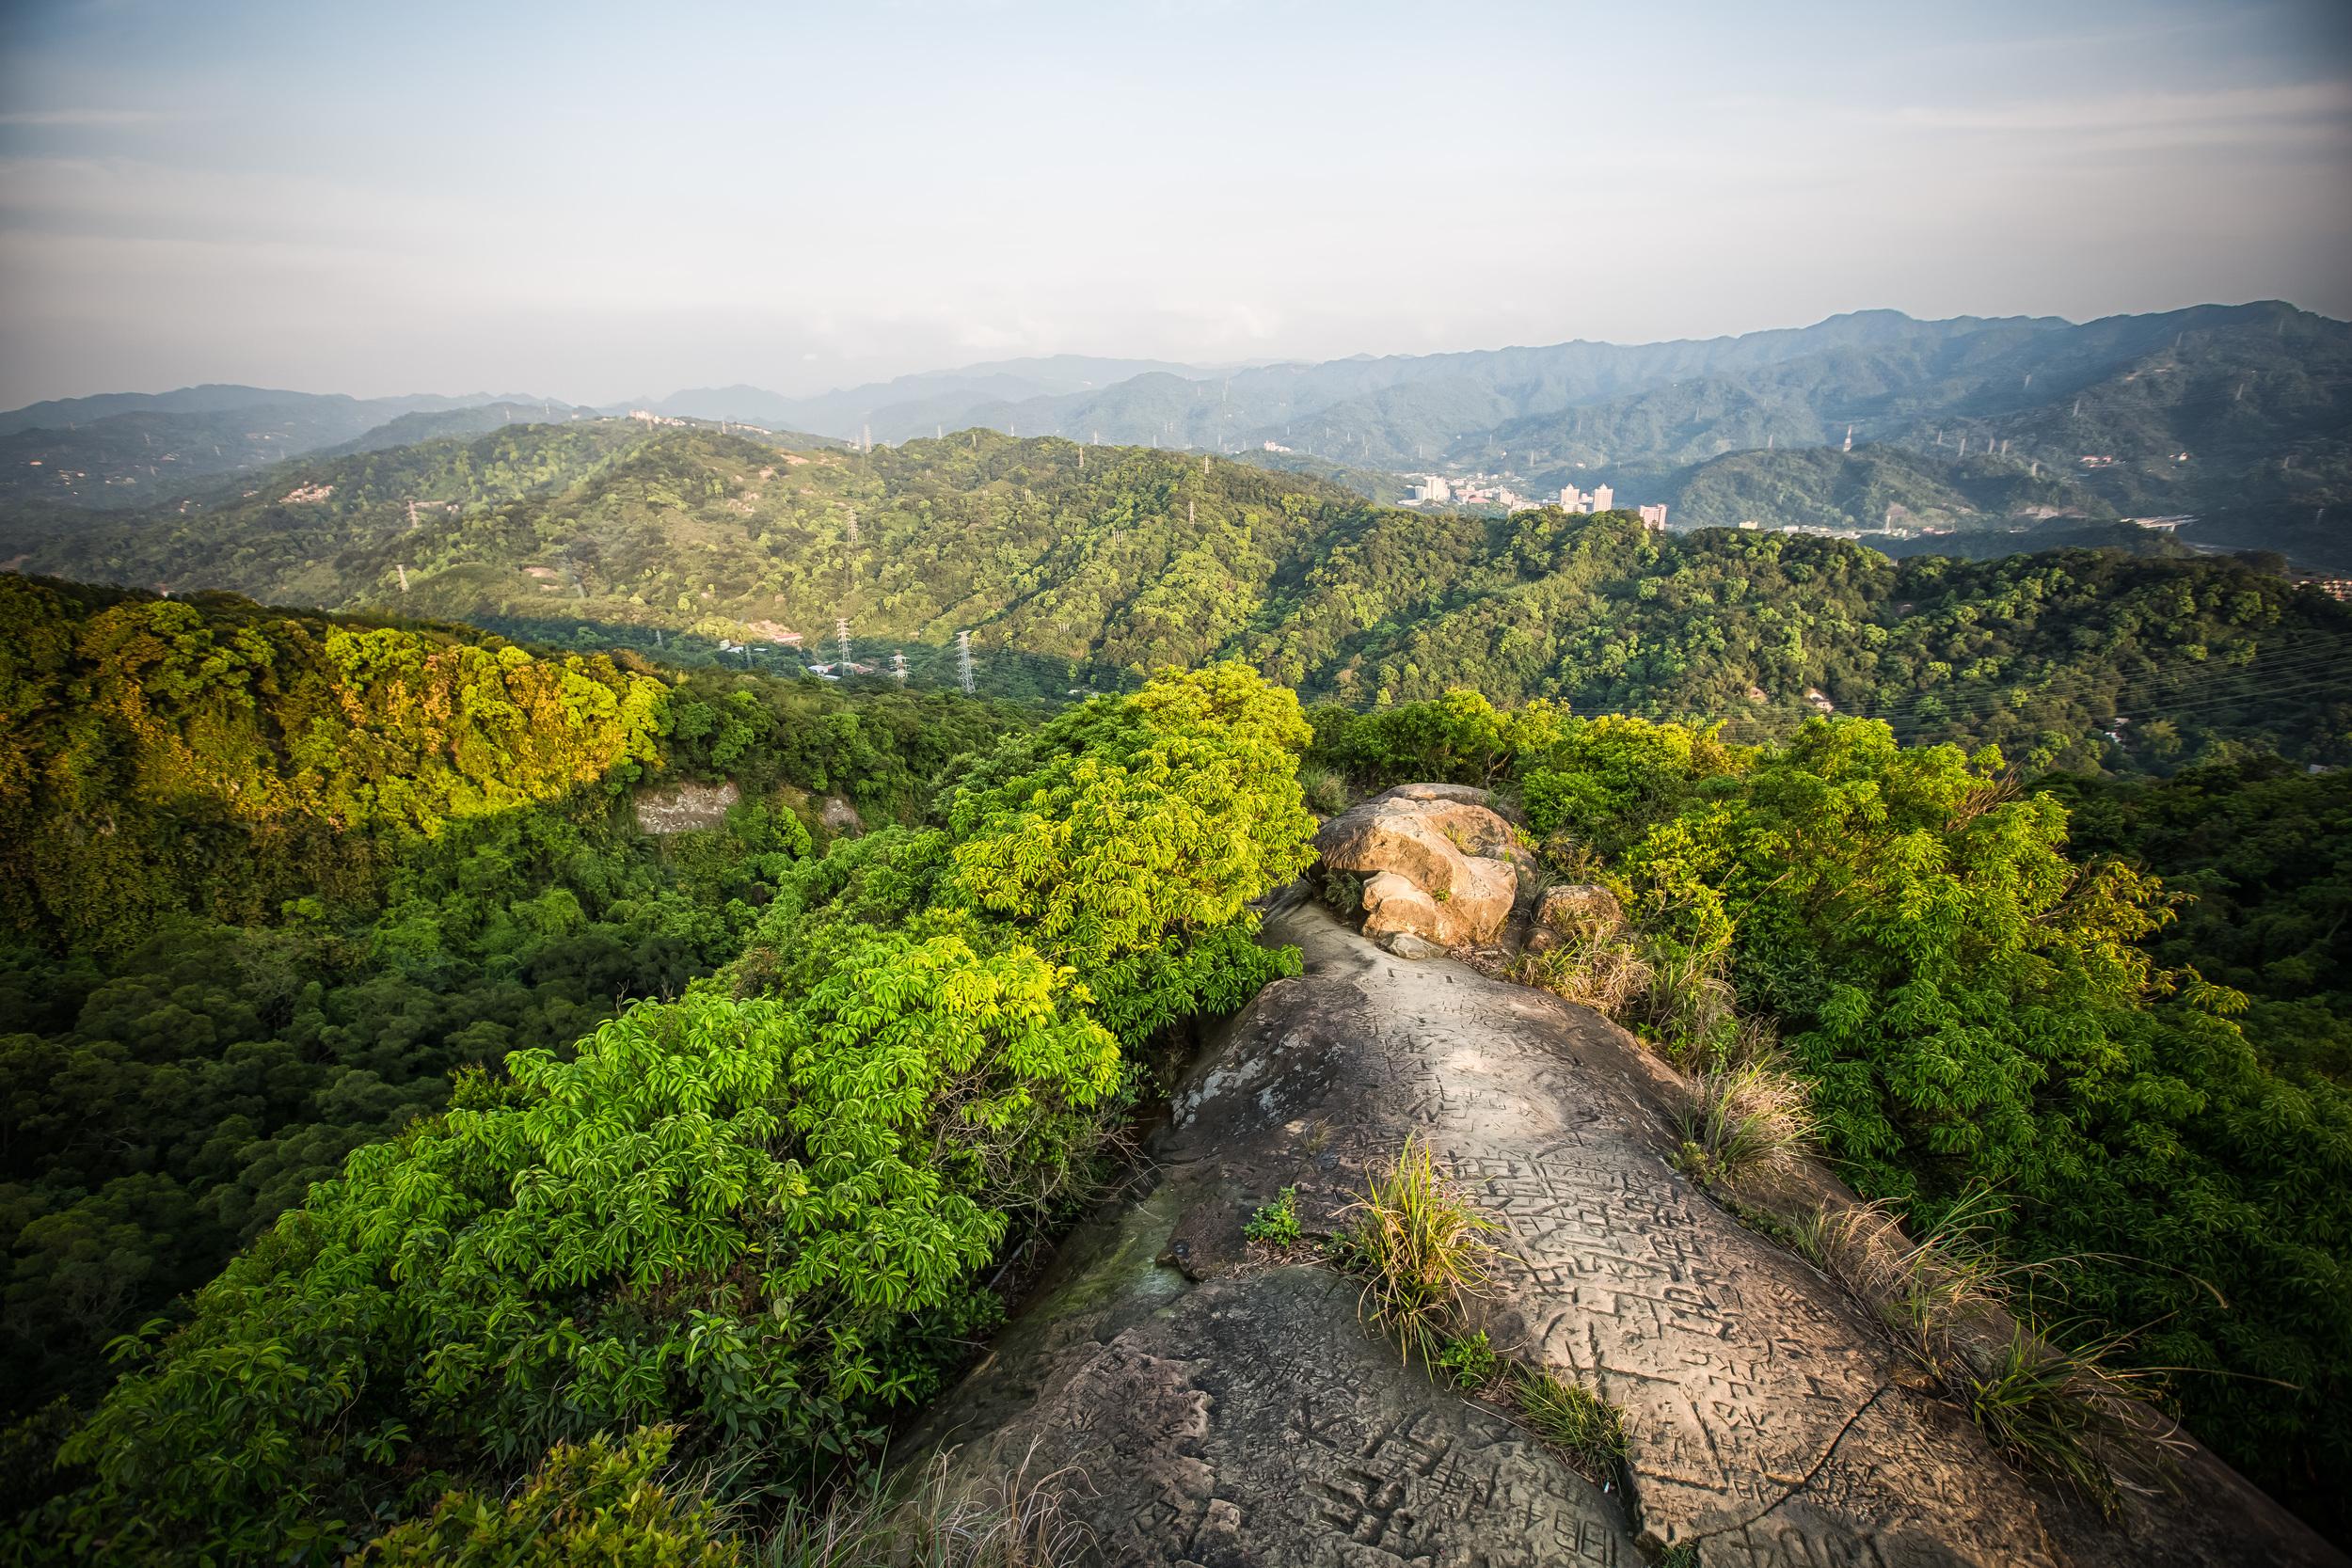 The peak of Thumb Mountain (拇指山)